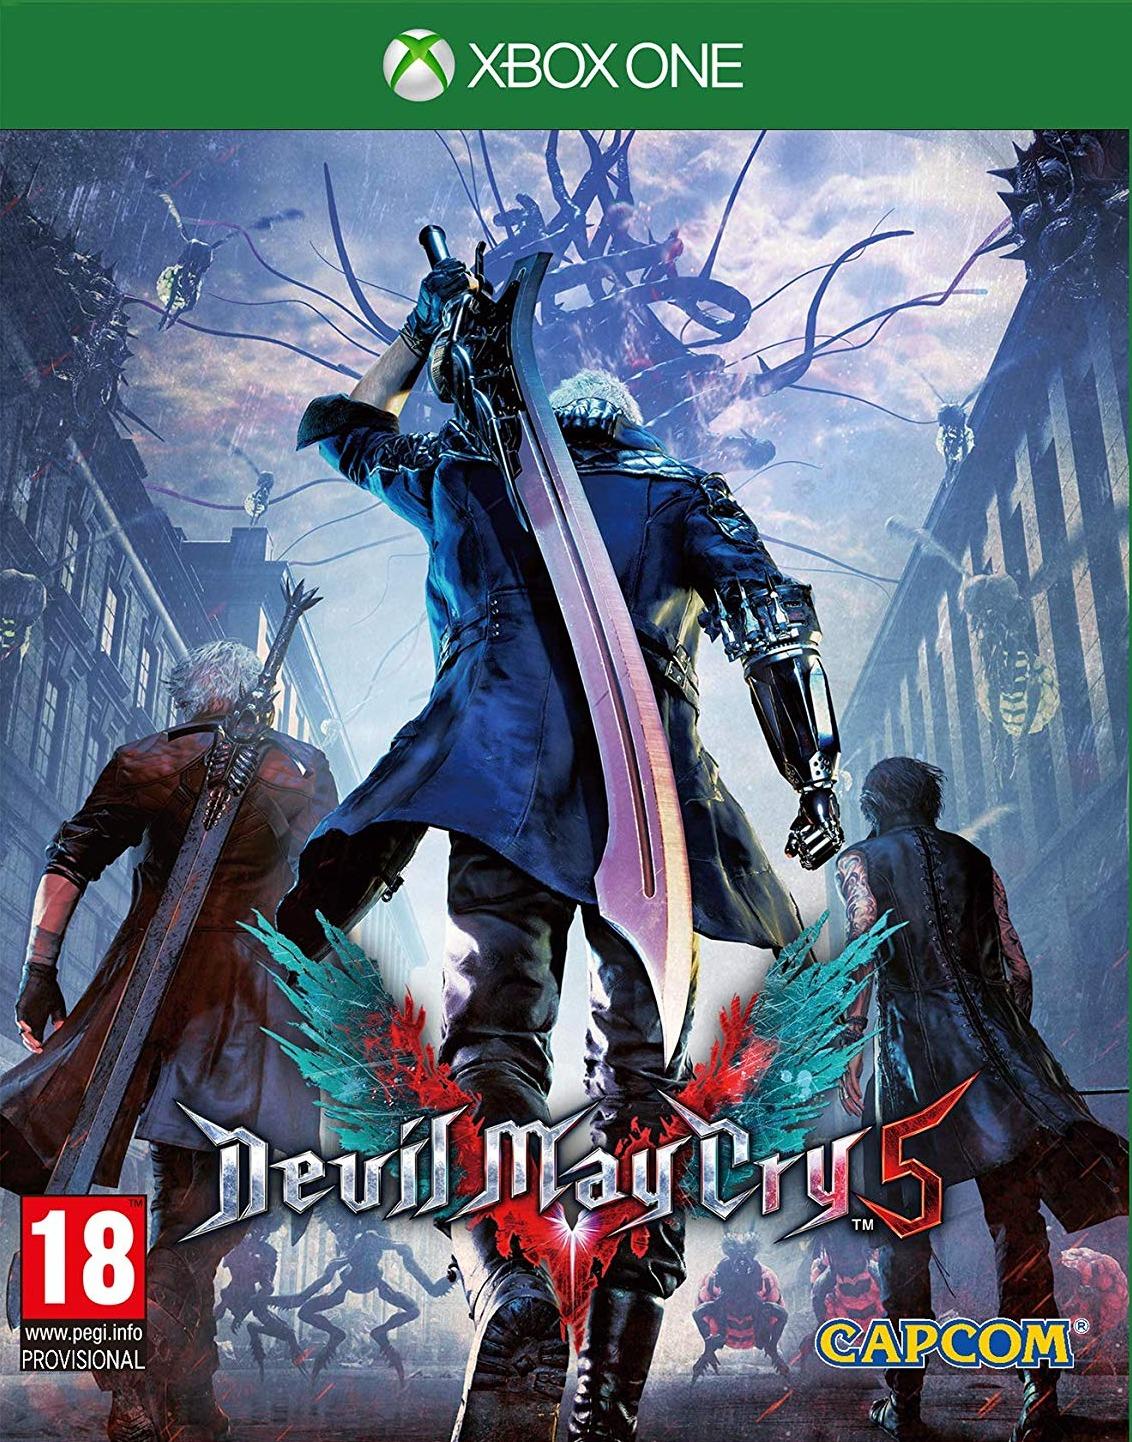 Devil May Cry 5 (XONE)